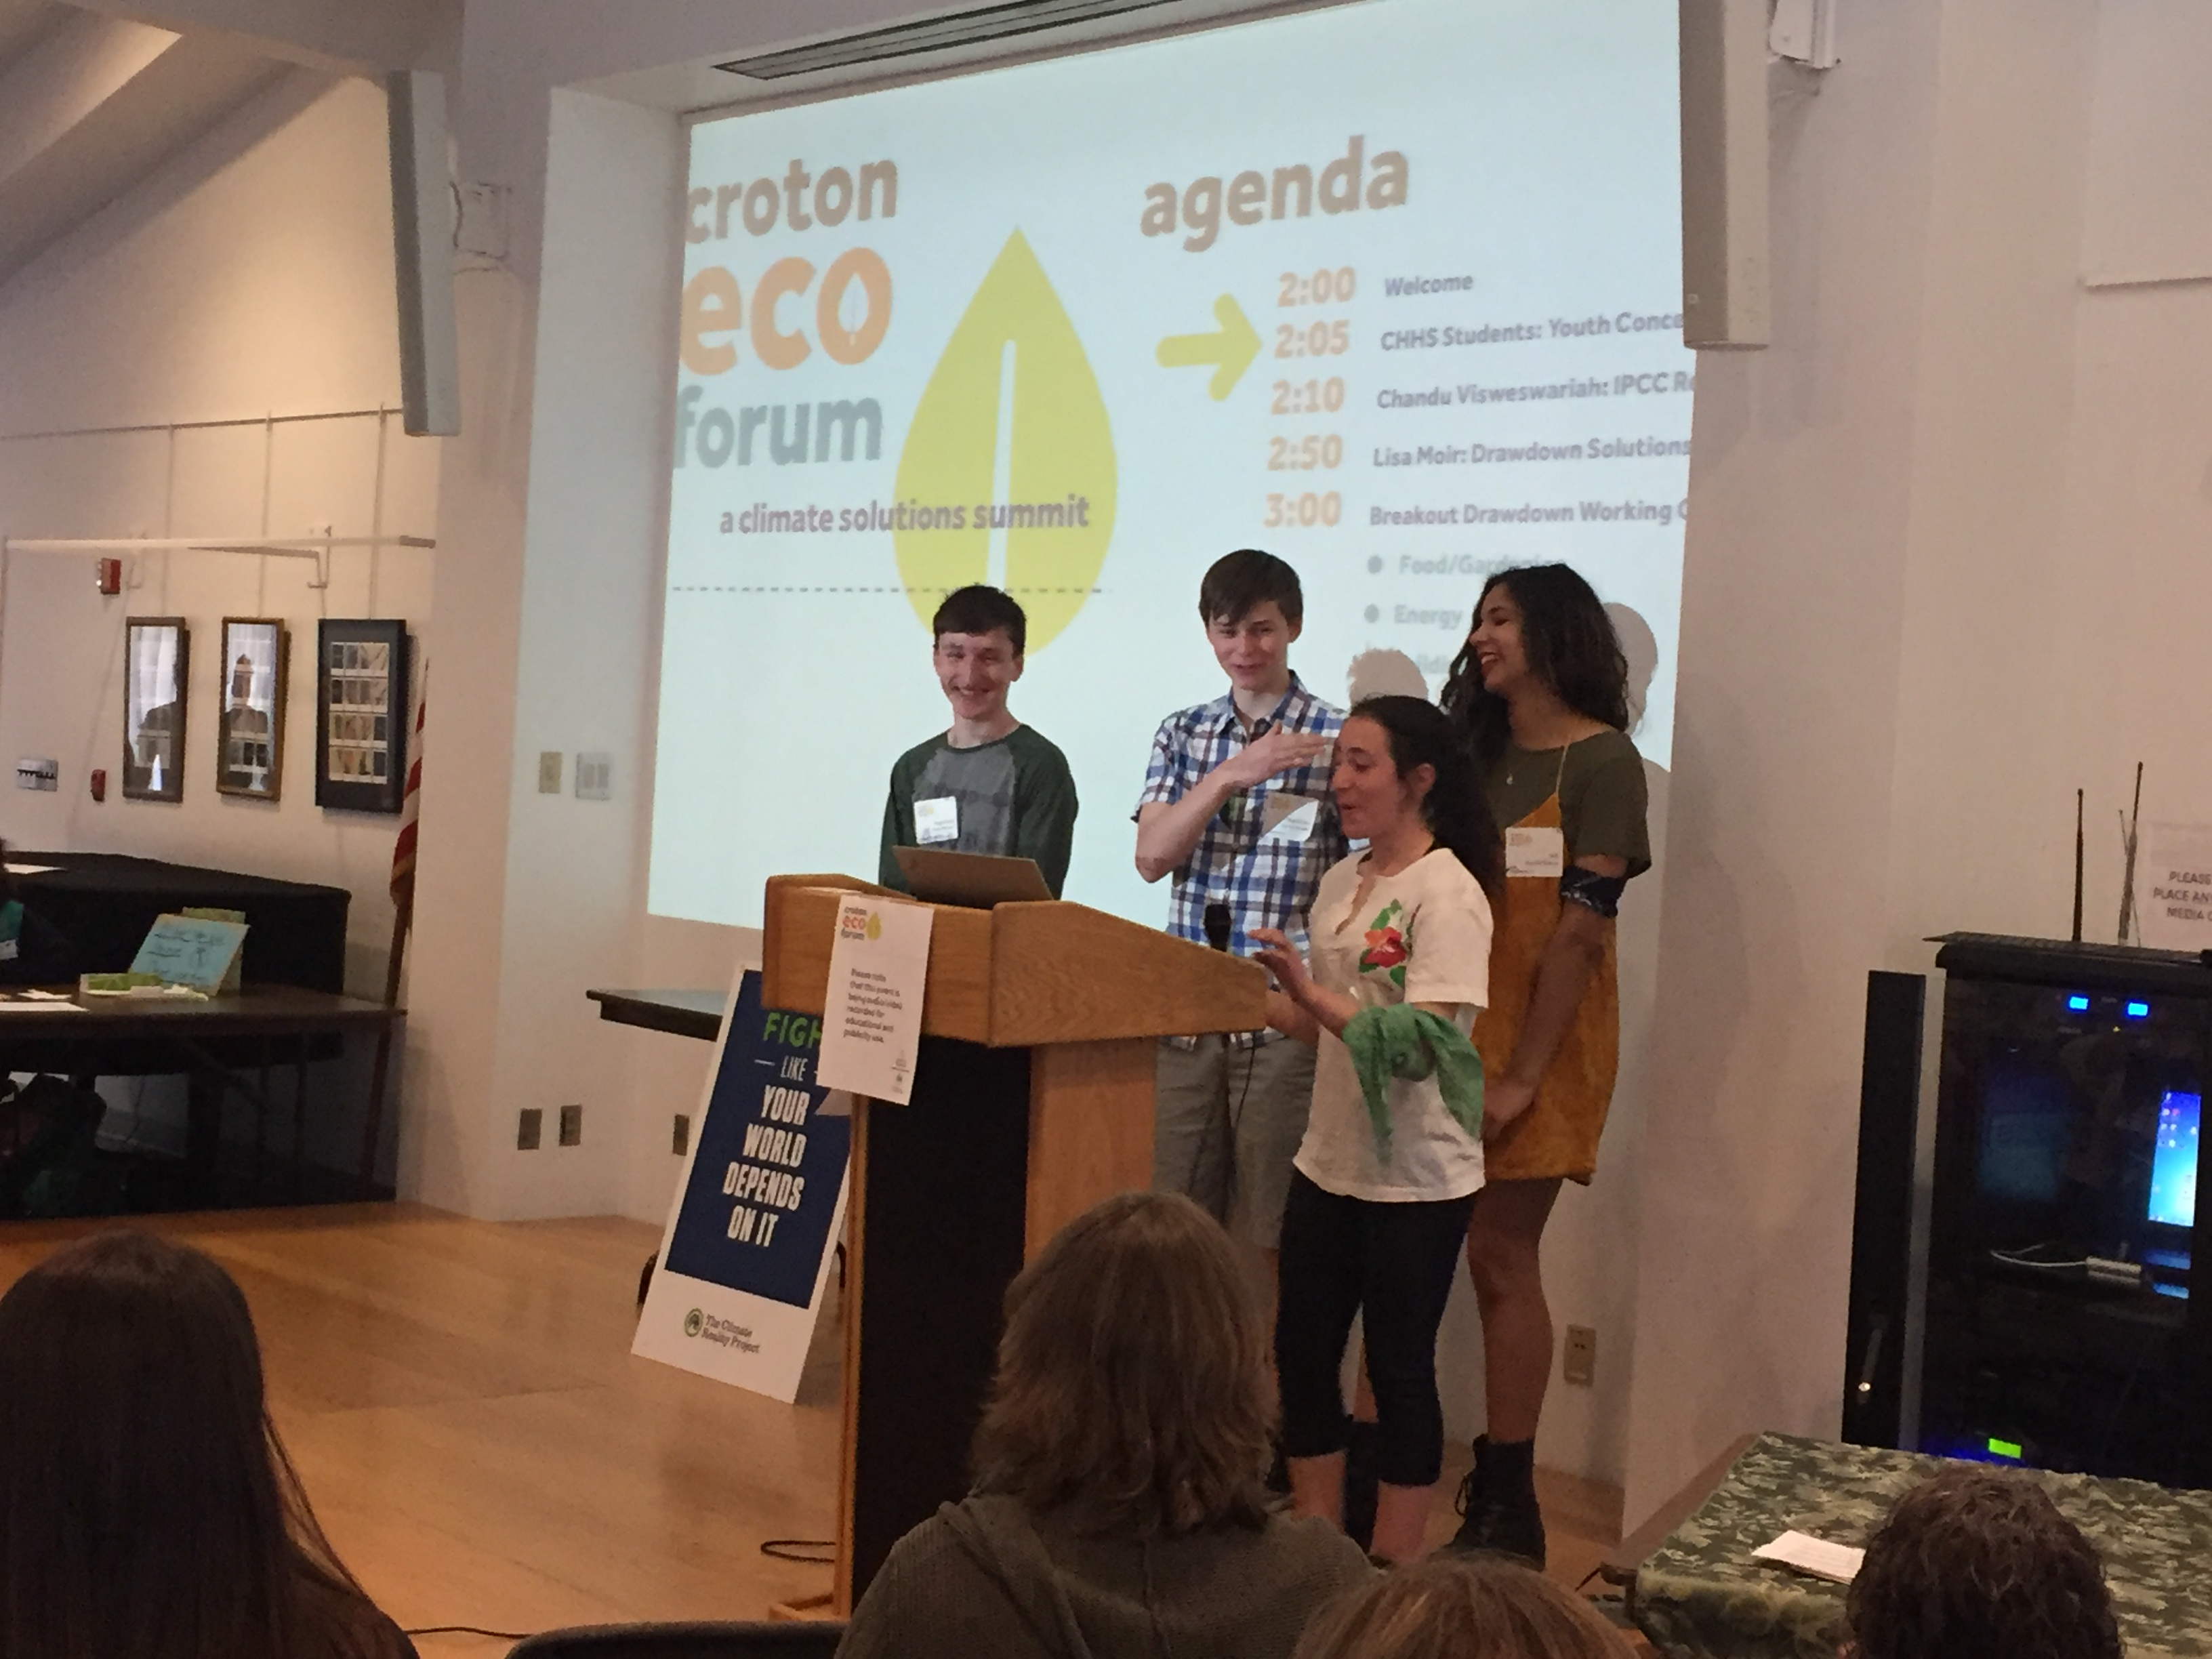 NY_Croton_Team_EcoForum_20190409_9300.JPG